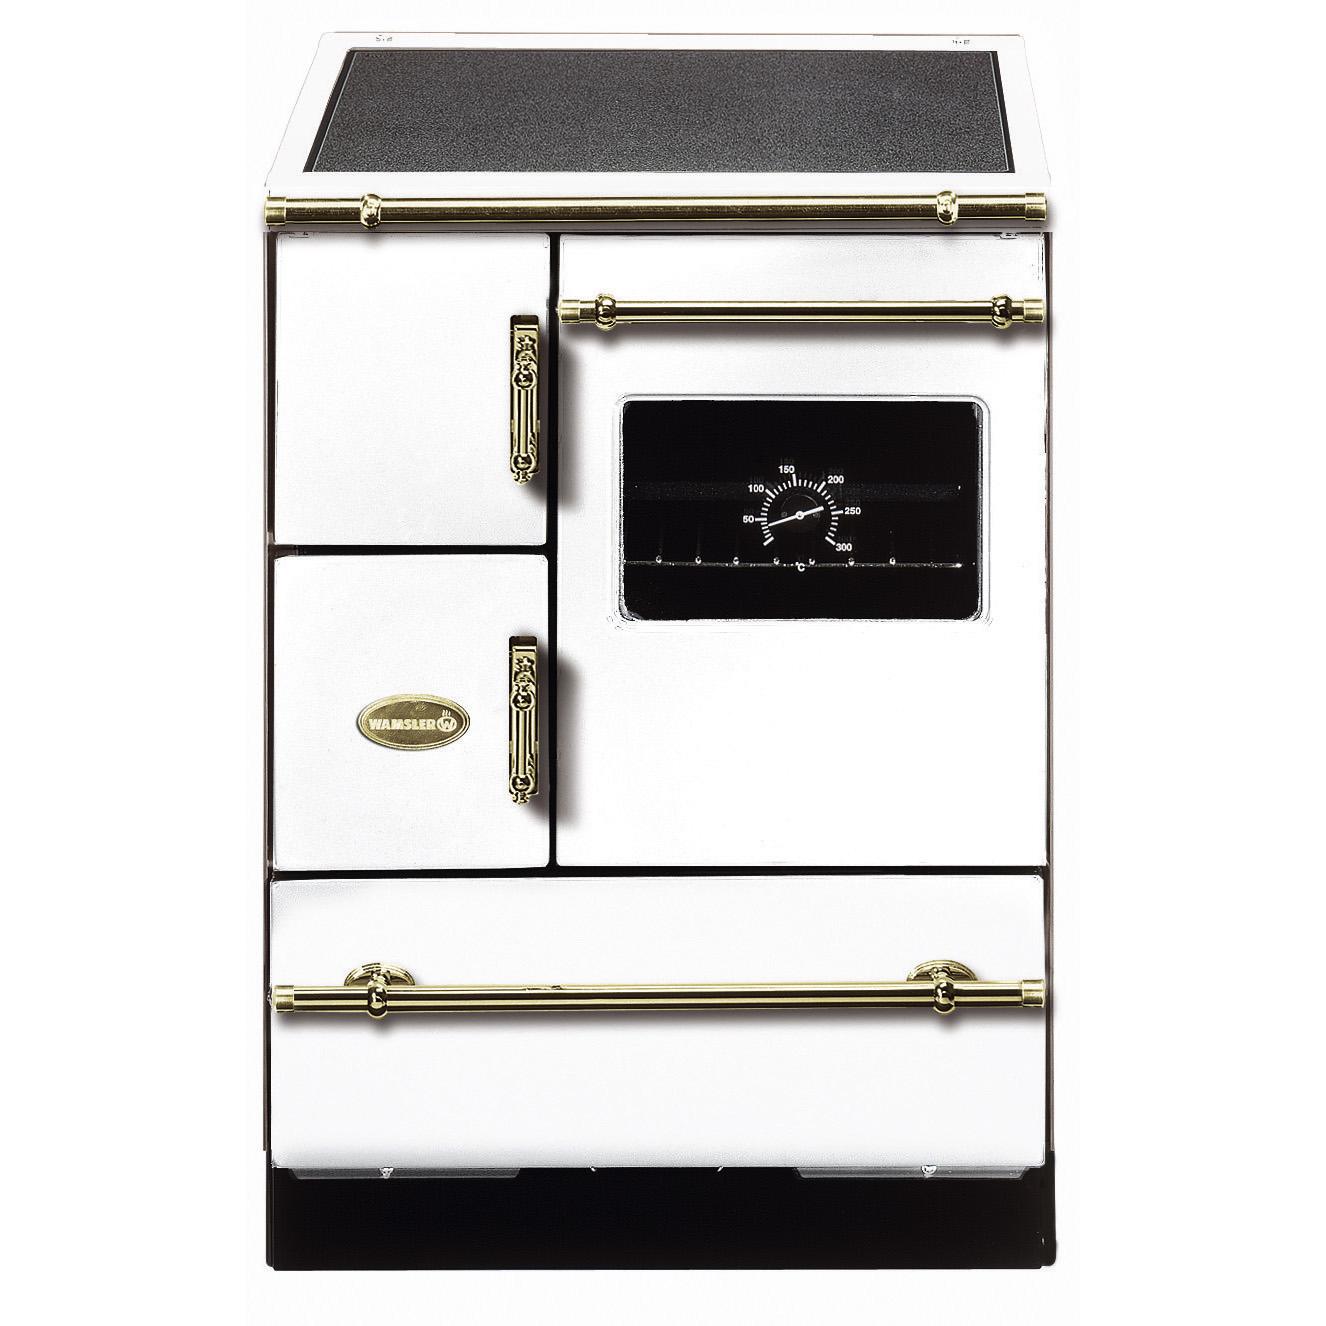 creative line k 118 cl weiss wamsler gmbh. Black Bedroom Furniture Sets. Home Design Ideas